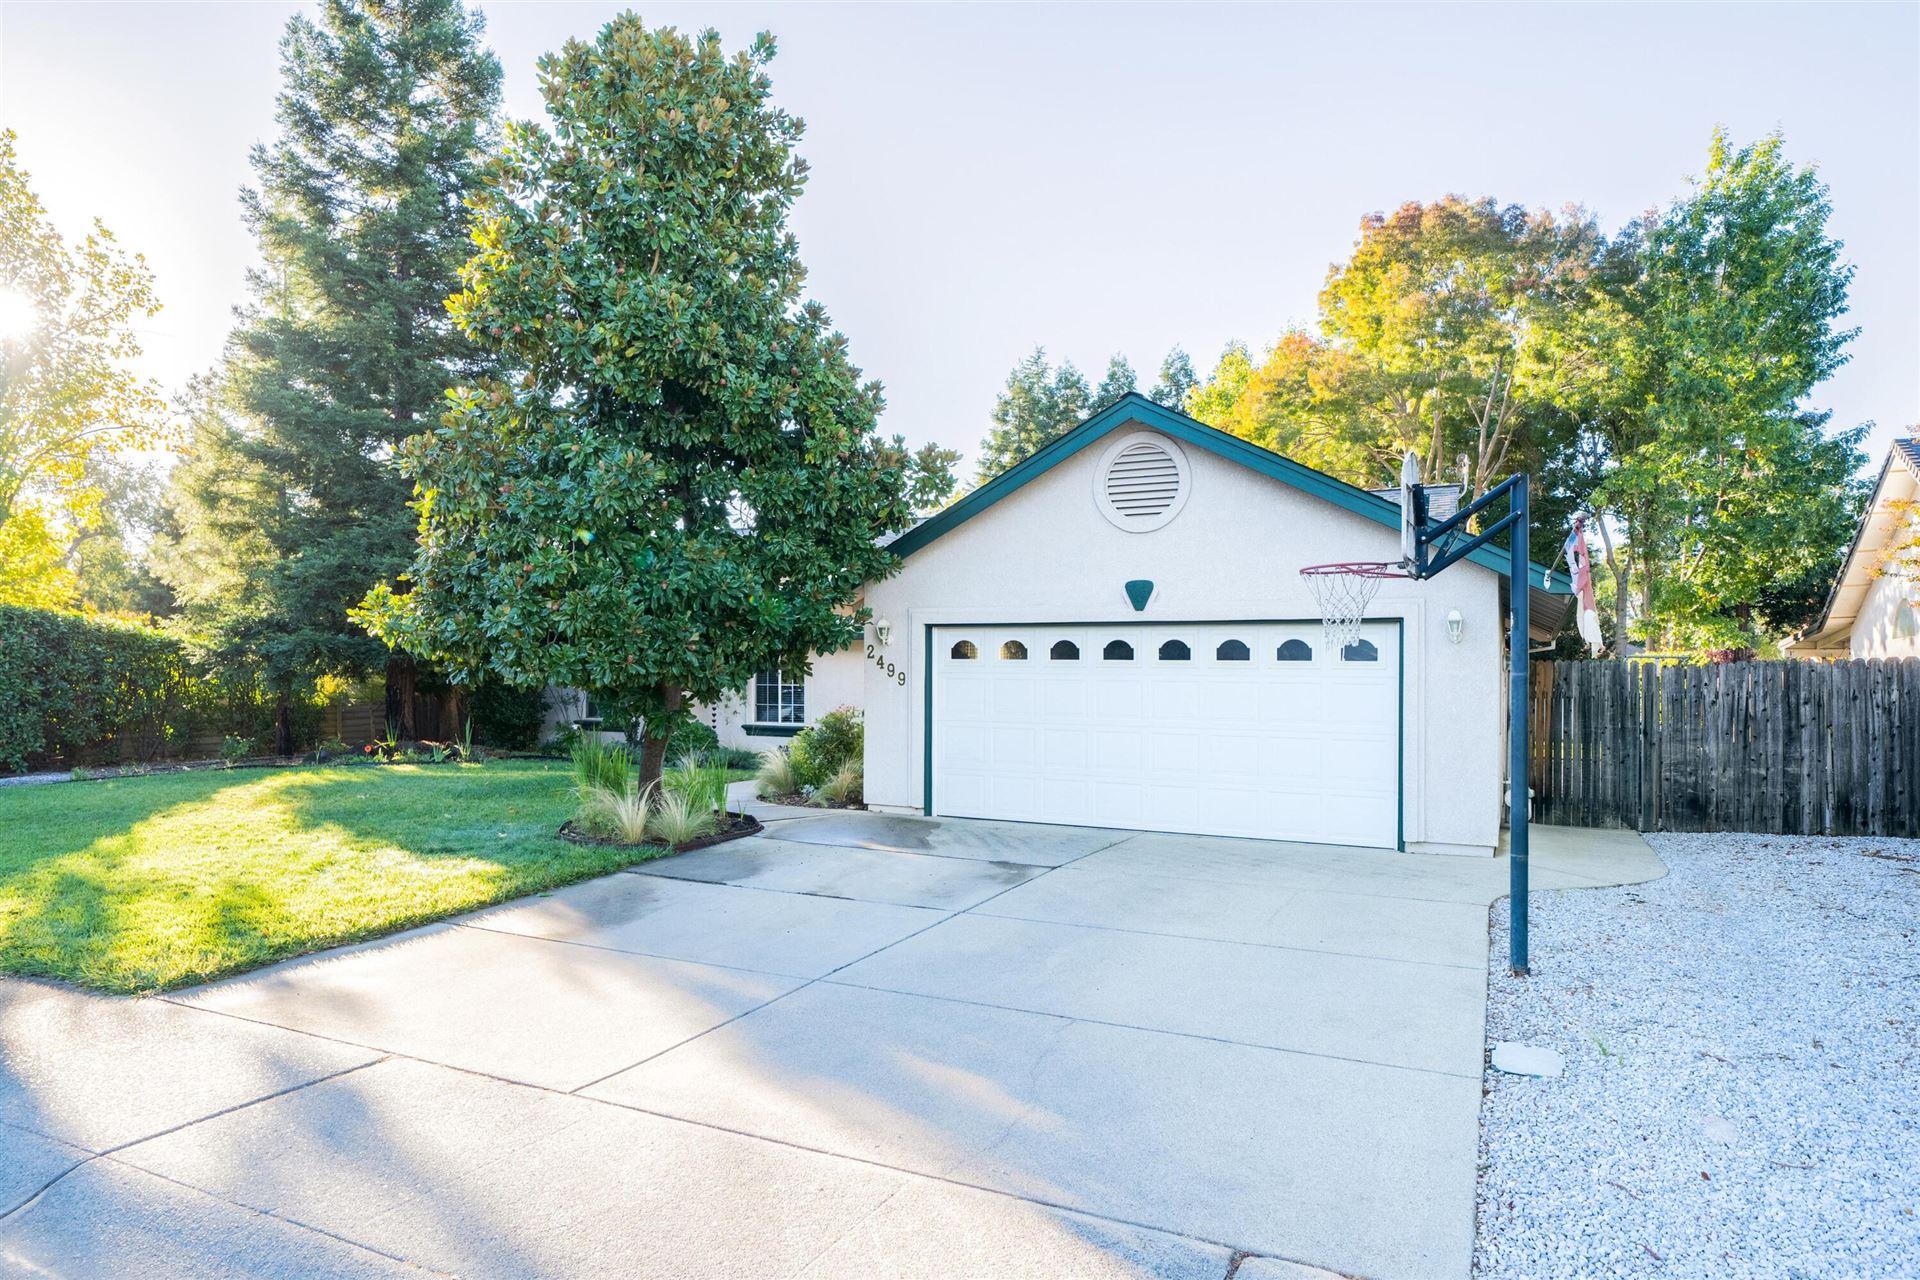 Photo of 2499 Castlewood Dr, Redding, CA 96002 (MLS # 21-4895)